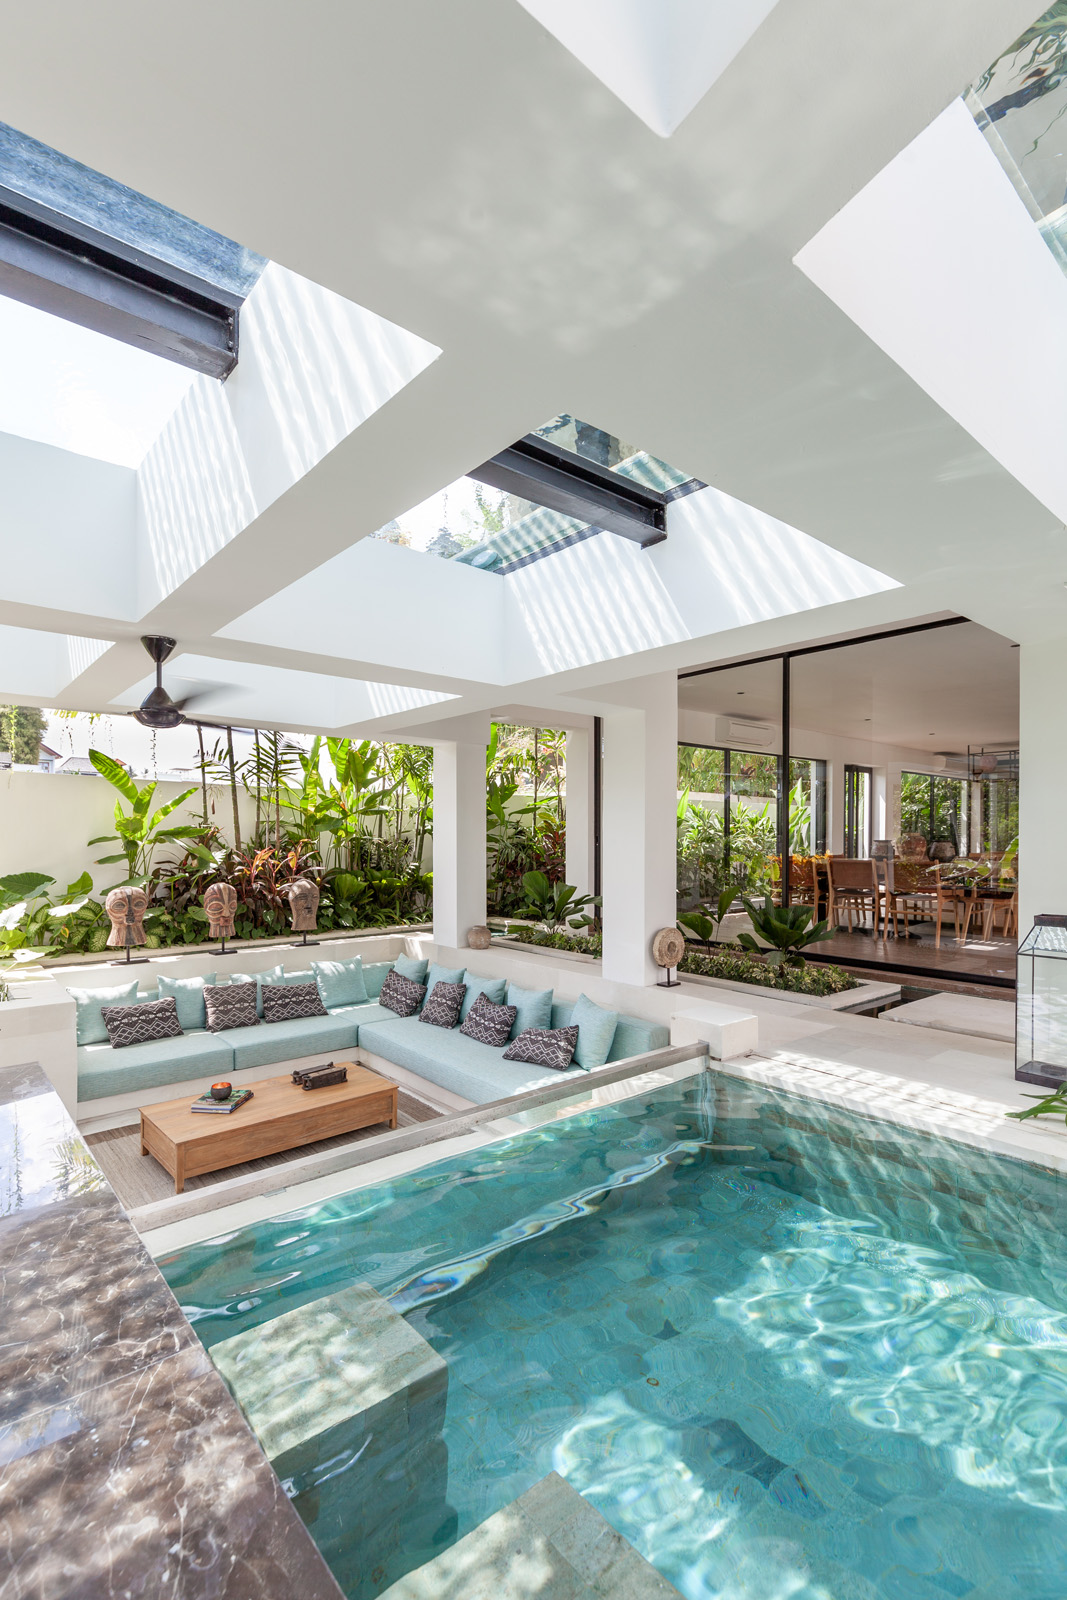 Villa Shahzadi, Sukyf Architects, Bali Interiors